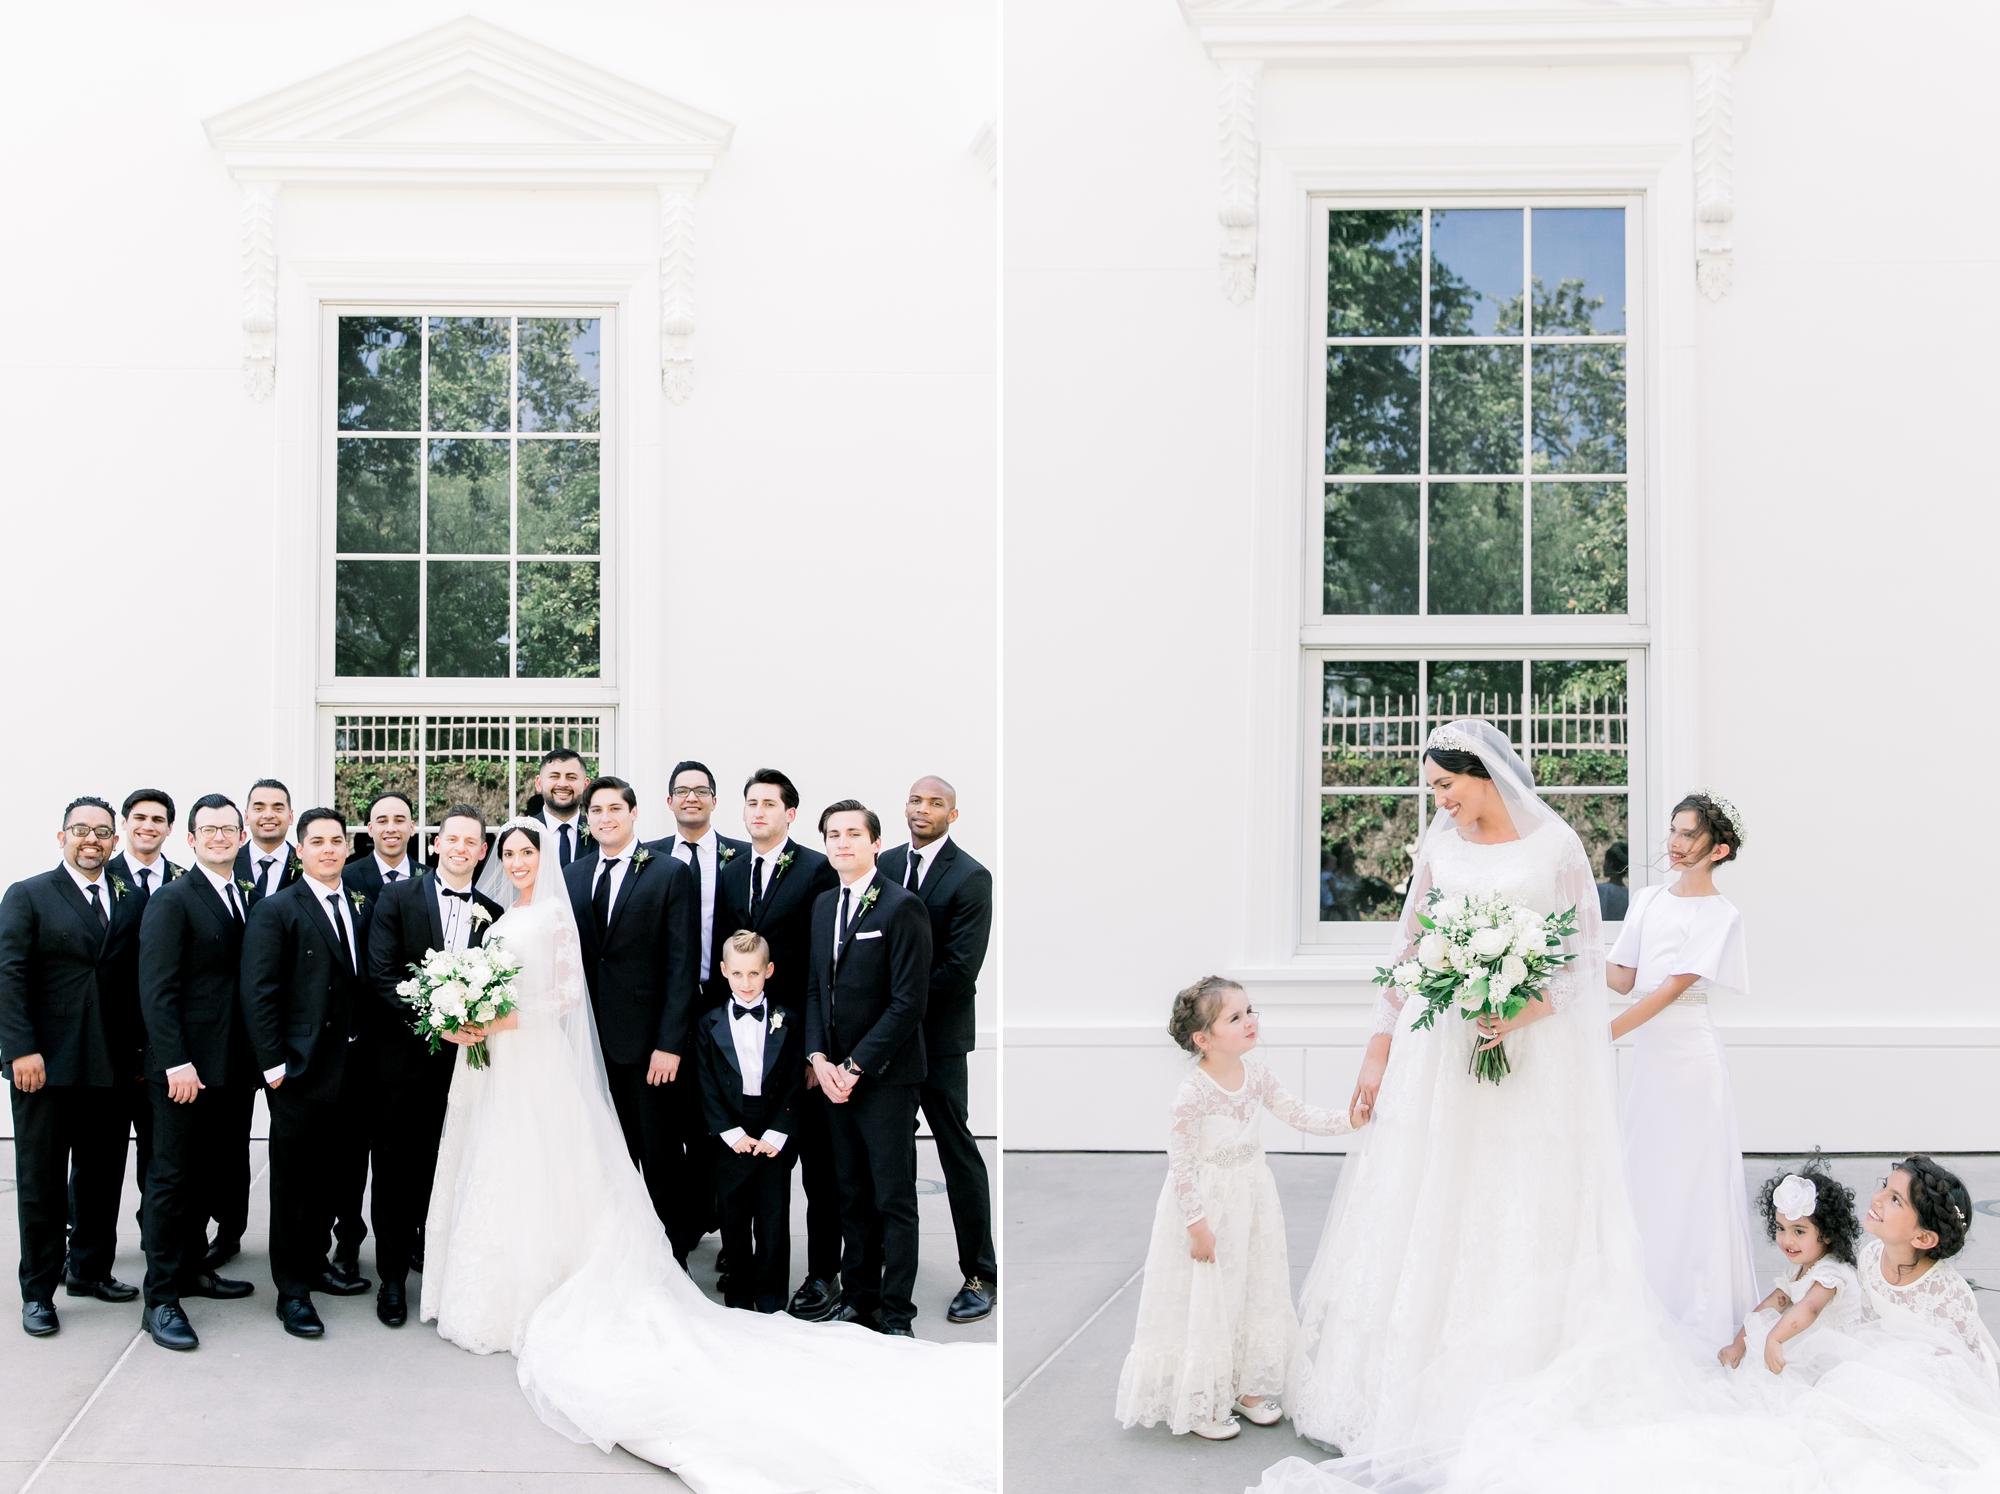 ROYAL-WEDDING-RICHARD-NIXON-LIBRARY 3.jpg